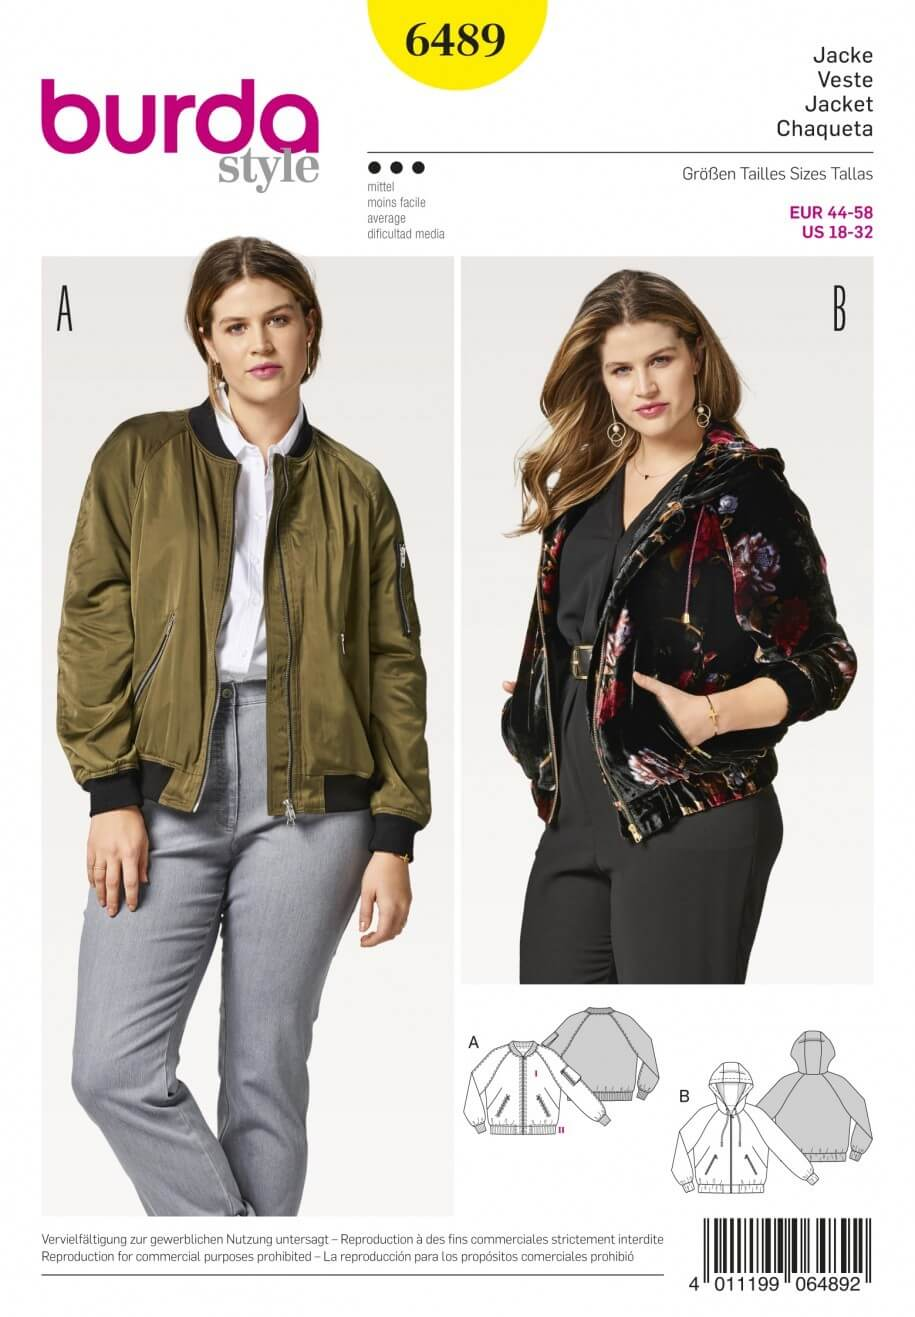 Burda Style Women's Plus Size Casual Hooded jacket Sewing Pattern 6489